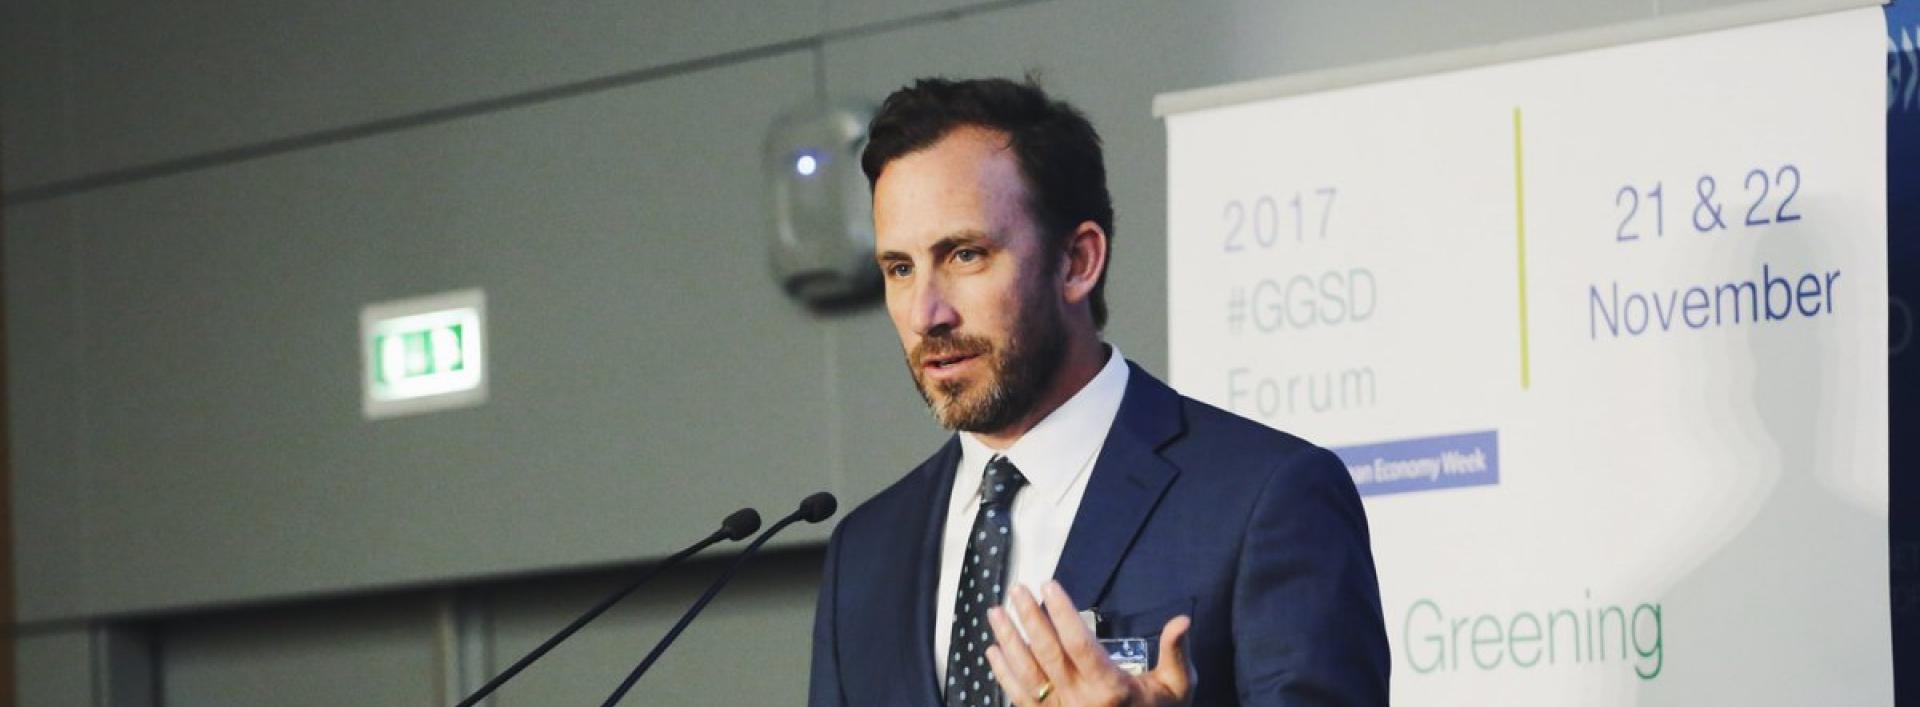 Man in a suit speaking at podium at GGSD Forum